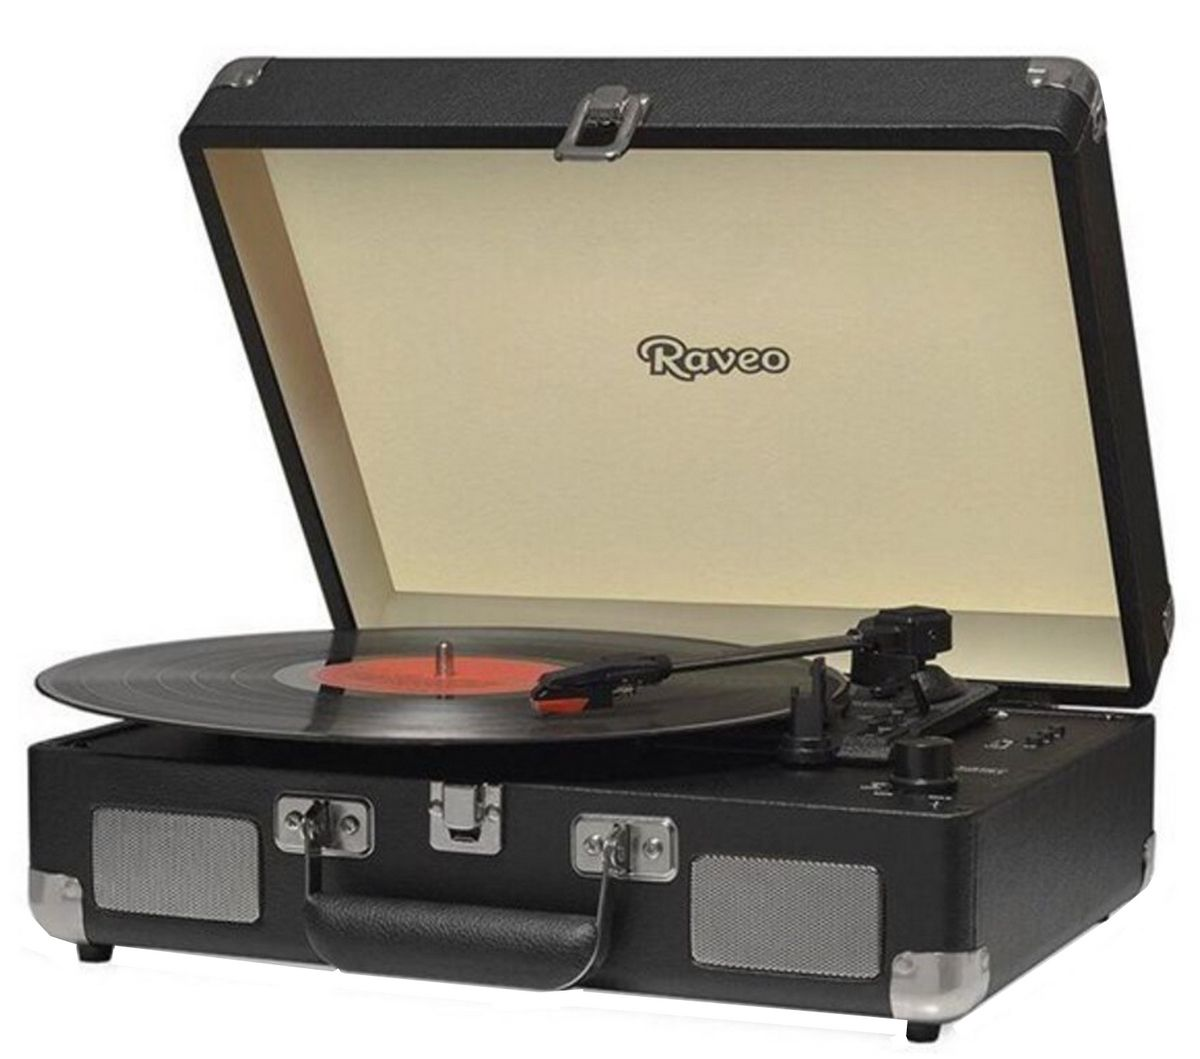 Vitrola Raveo Sonetto Black Toca-Discos Bluetooth Reproduz Grava Bivolt  Usb Retrô